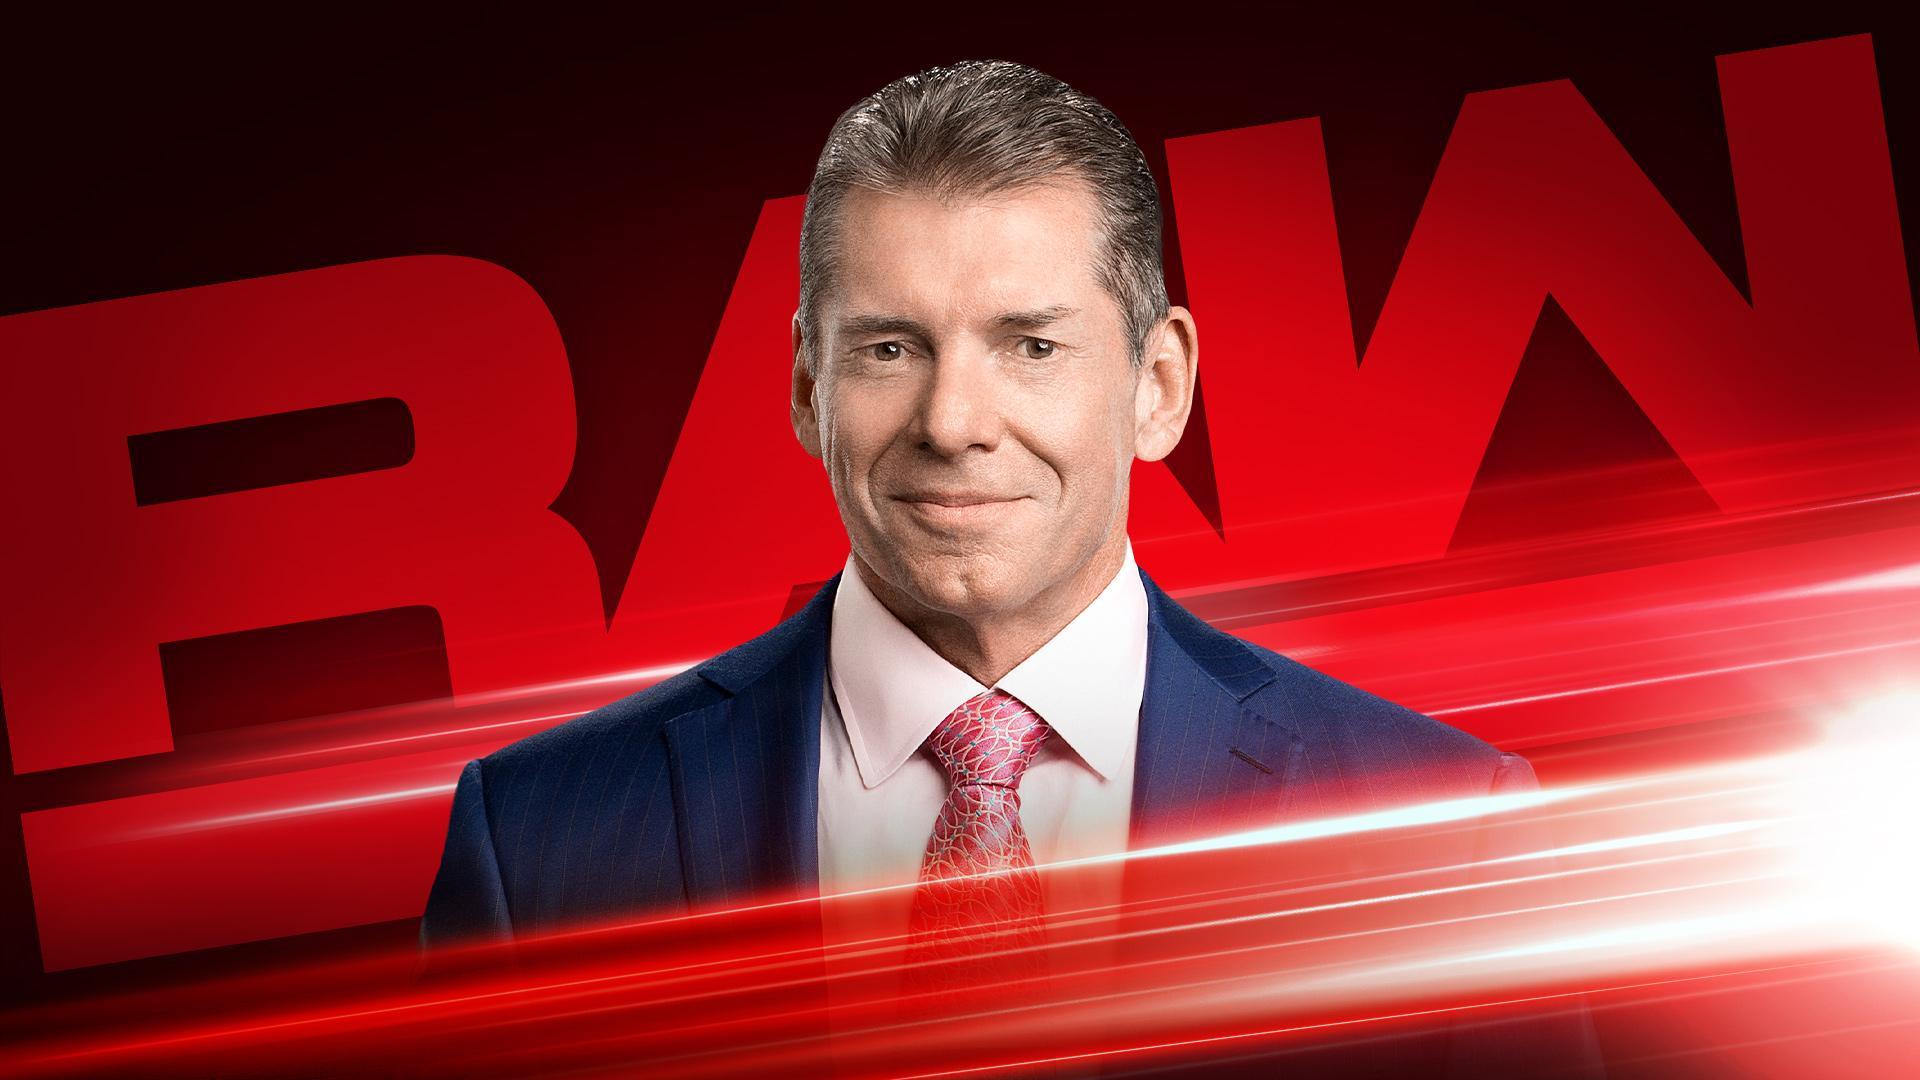 BREAKING: @VinceMcMahon returns to #RAW this Monday night! https://t.co/EDpbQXFwdM https://t.co/ENmA1vZAnG